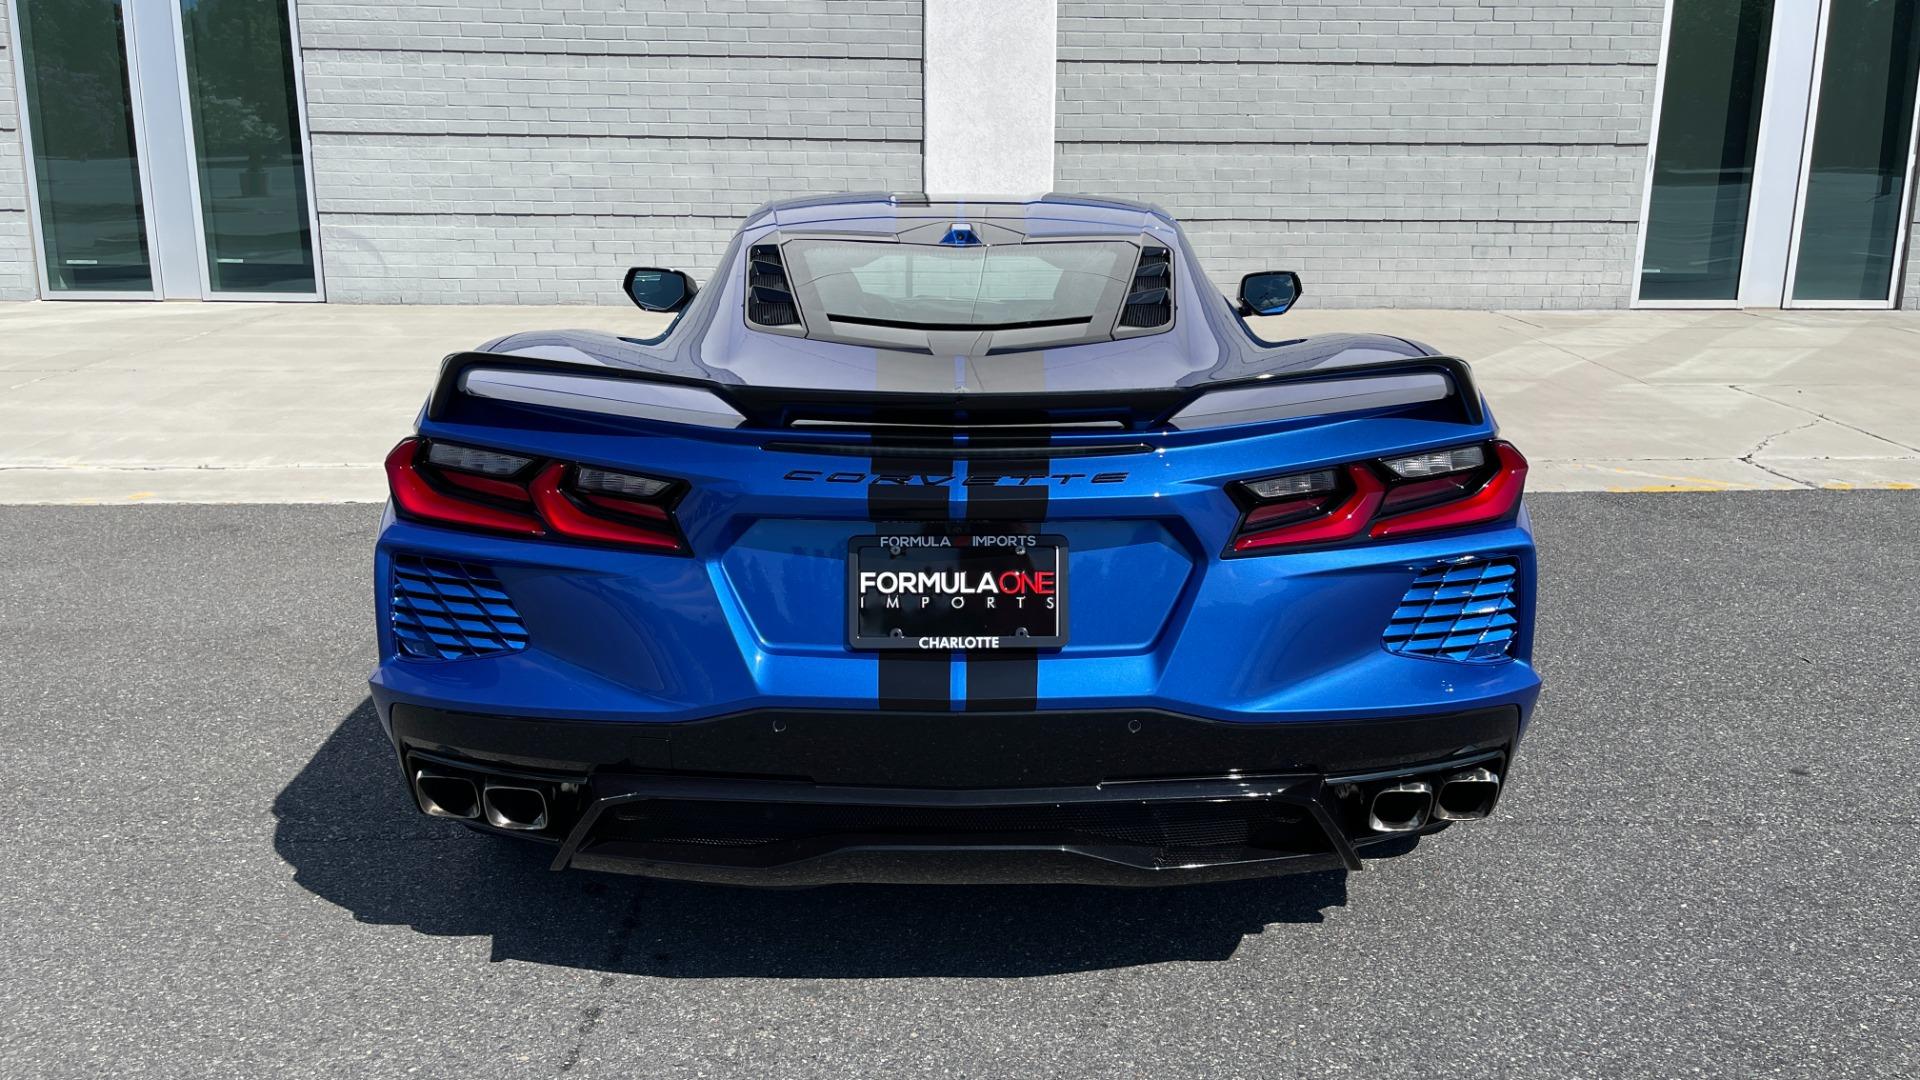 Used 2021 Chevrolet CORVETTE STINGRAY 3LT COUPE / 8-SPD / PERF PKG / NAV / BOSE / REARVIEW for sale $110,995 at Formula Imports in Charlotte NC 28227 13